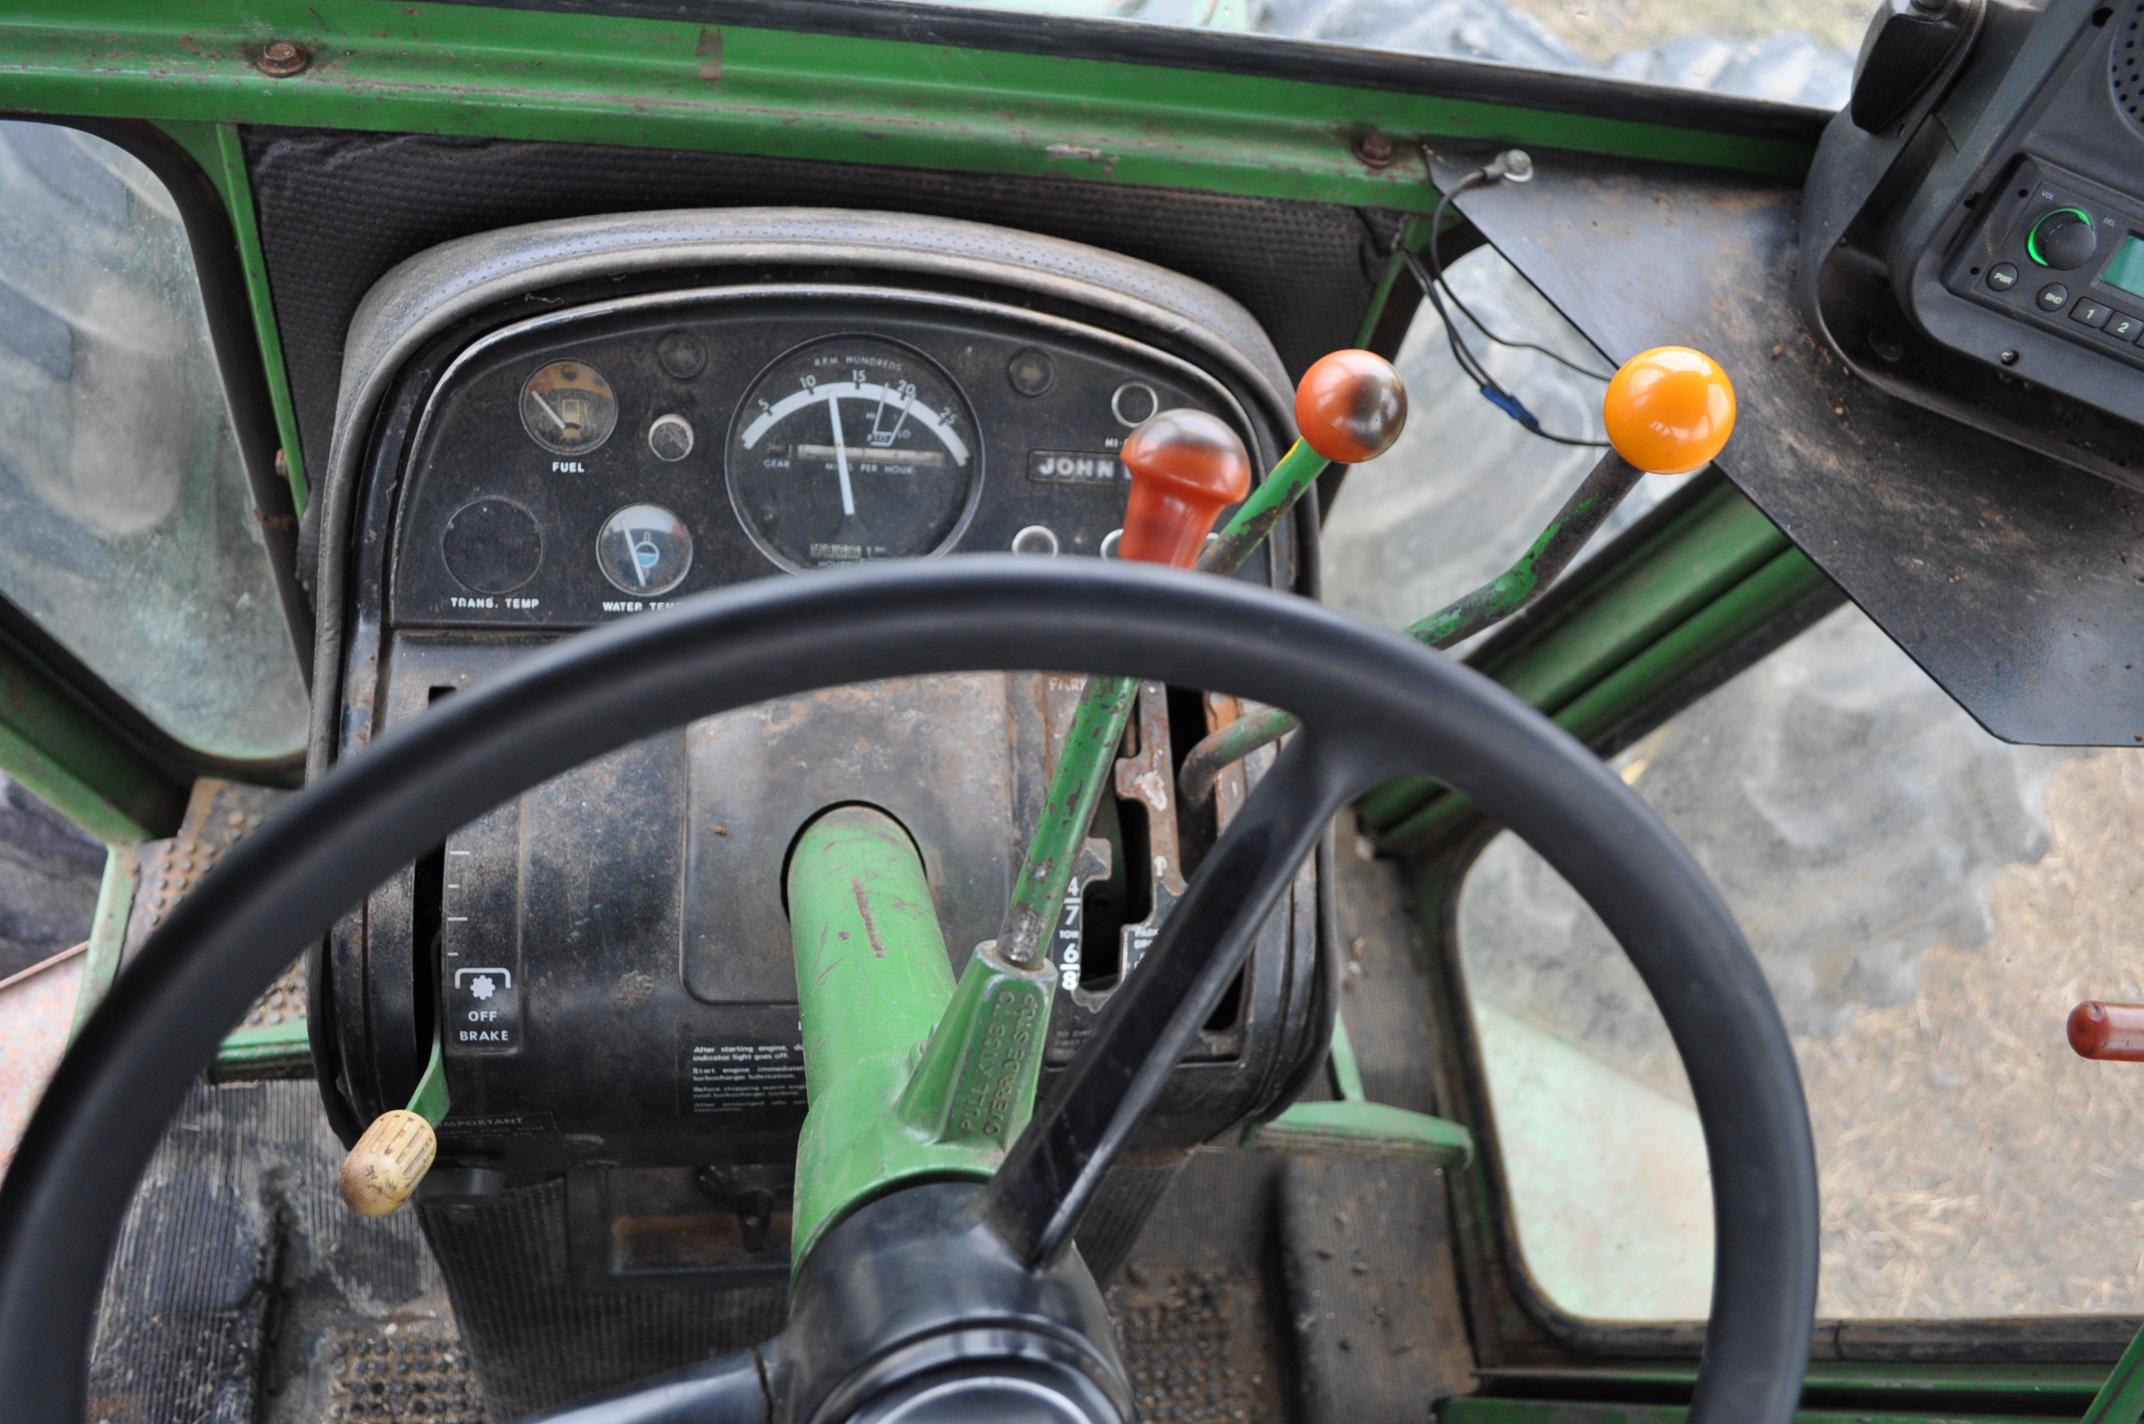 John Deere 7520 tractor, 4WD, diesel, 18.4-34 duals, original fenders, CHA, cab interior kit, 3 - Image 19 of 24